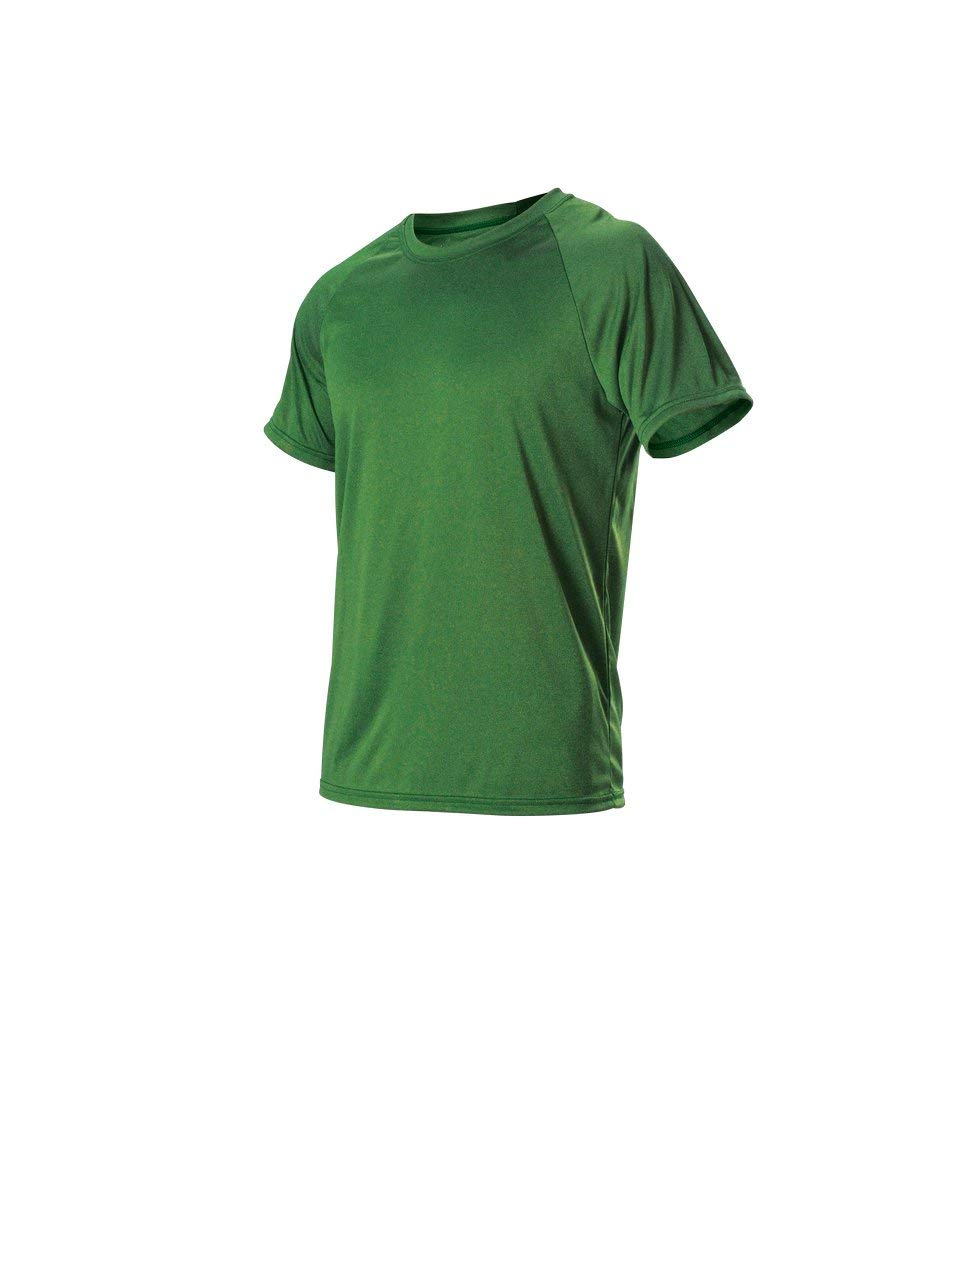 Alleson Ahtletic Unisex-Teen Youth Heather Tech Short Sleeve Tshirt